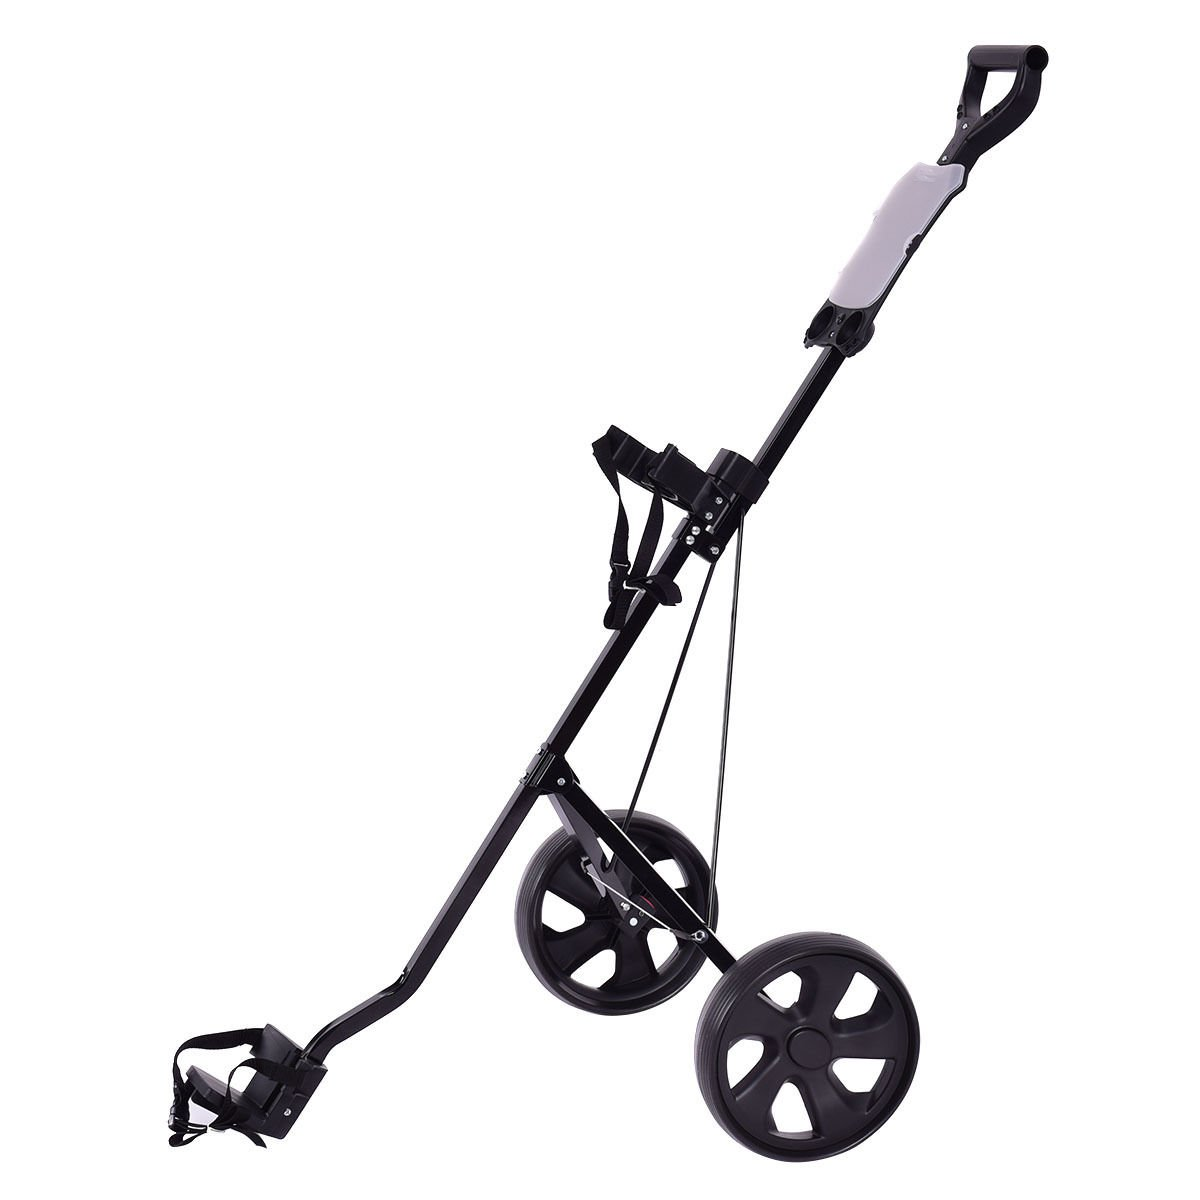 COSTWAY Golf Cart Foldable 2 Wheel Push Pull Cart Trolley